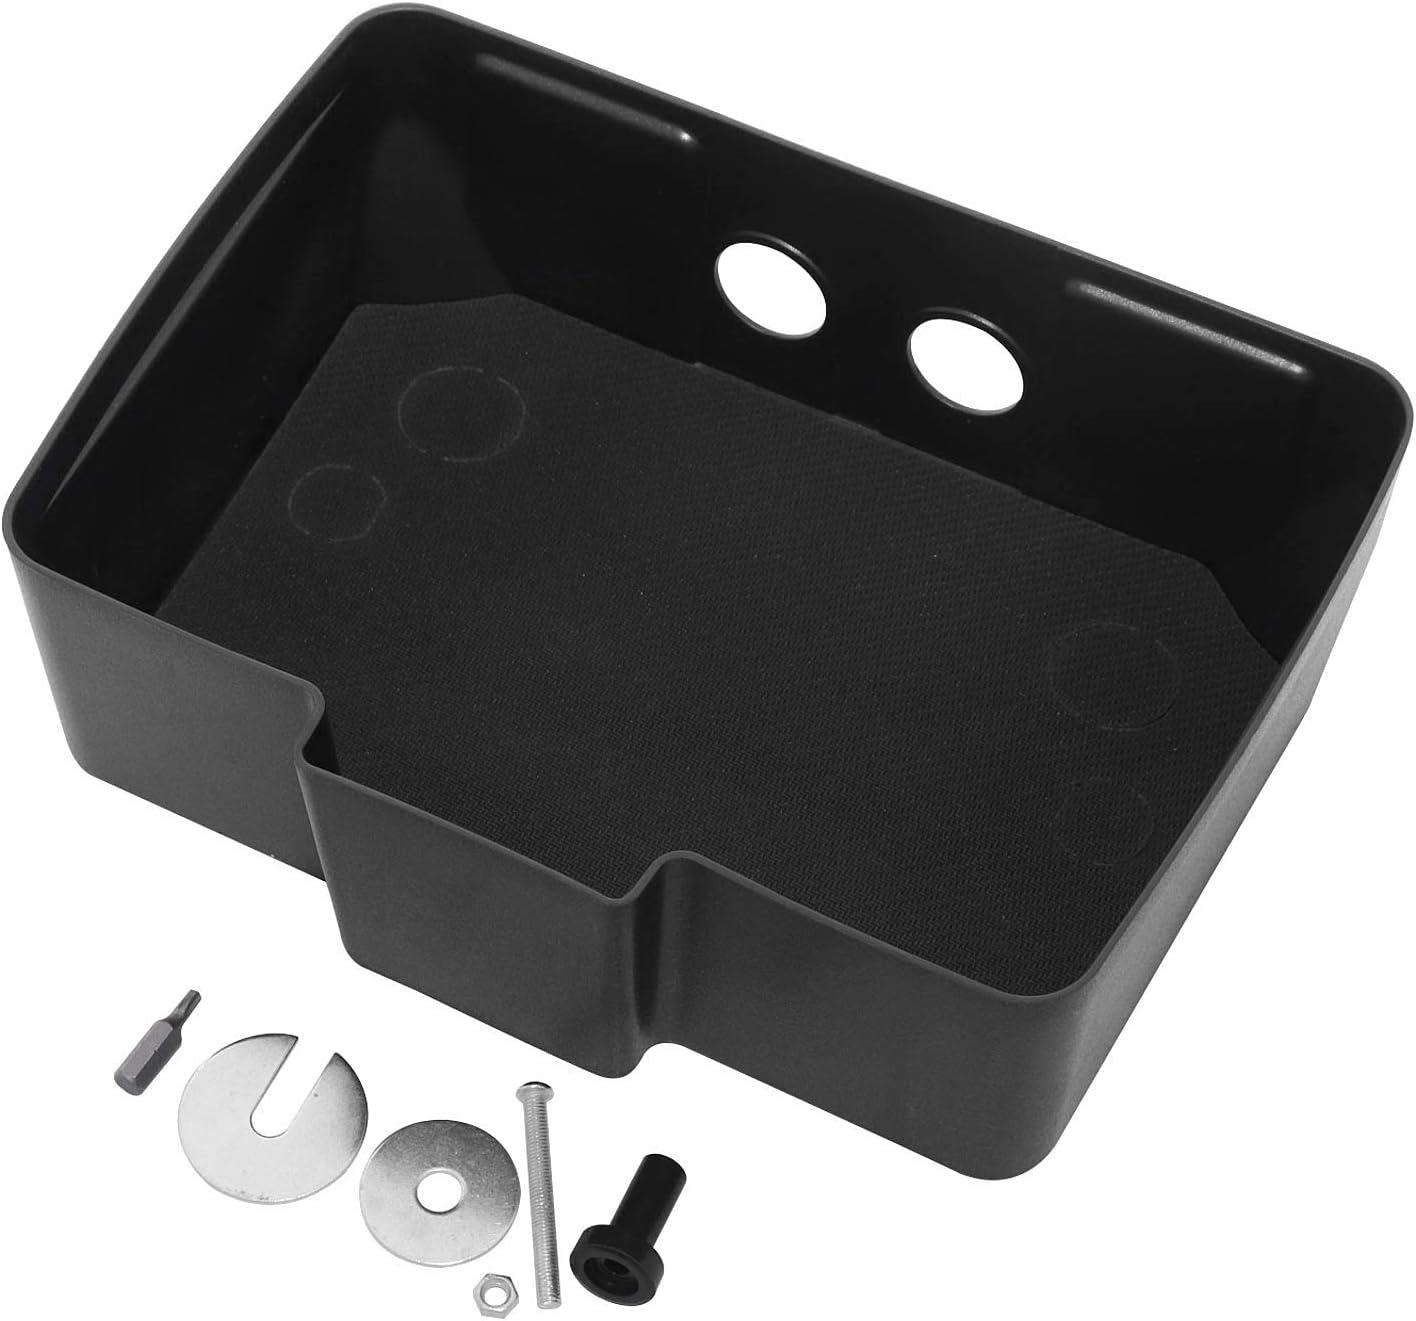 XMMT Black Hard Sale Special Price Saddlebag Organizer Kit Tray #TS100HD Mesa Mall Harley For